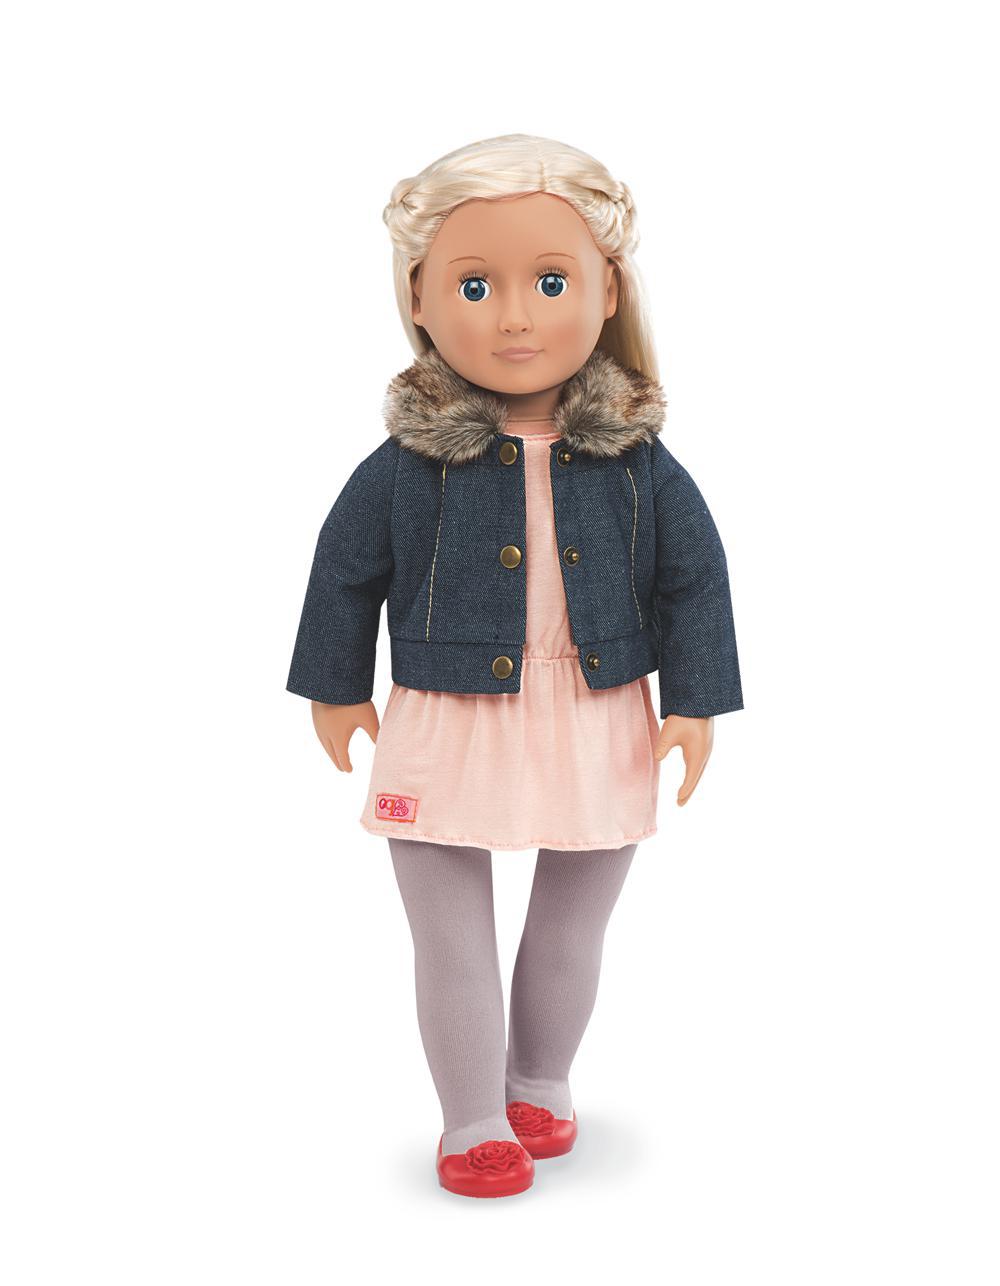 Outfit Set OG - Just Fur You for 18 Doll